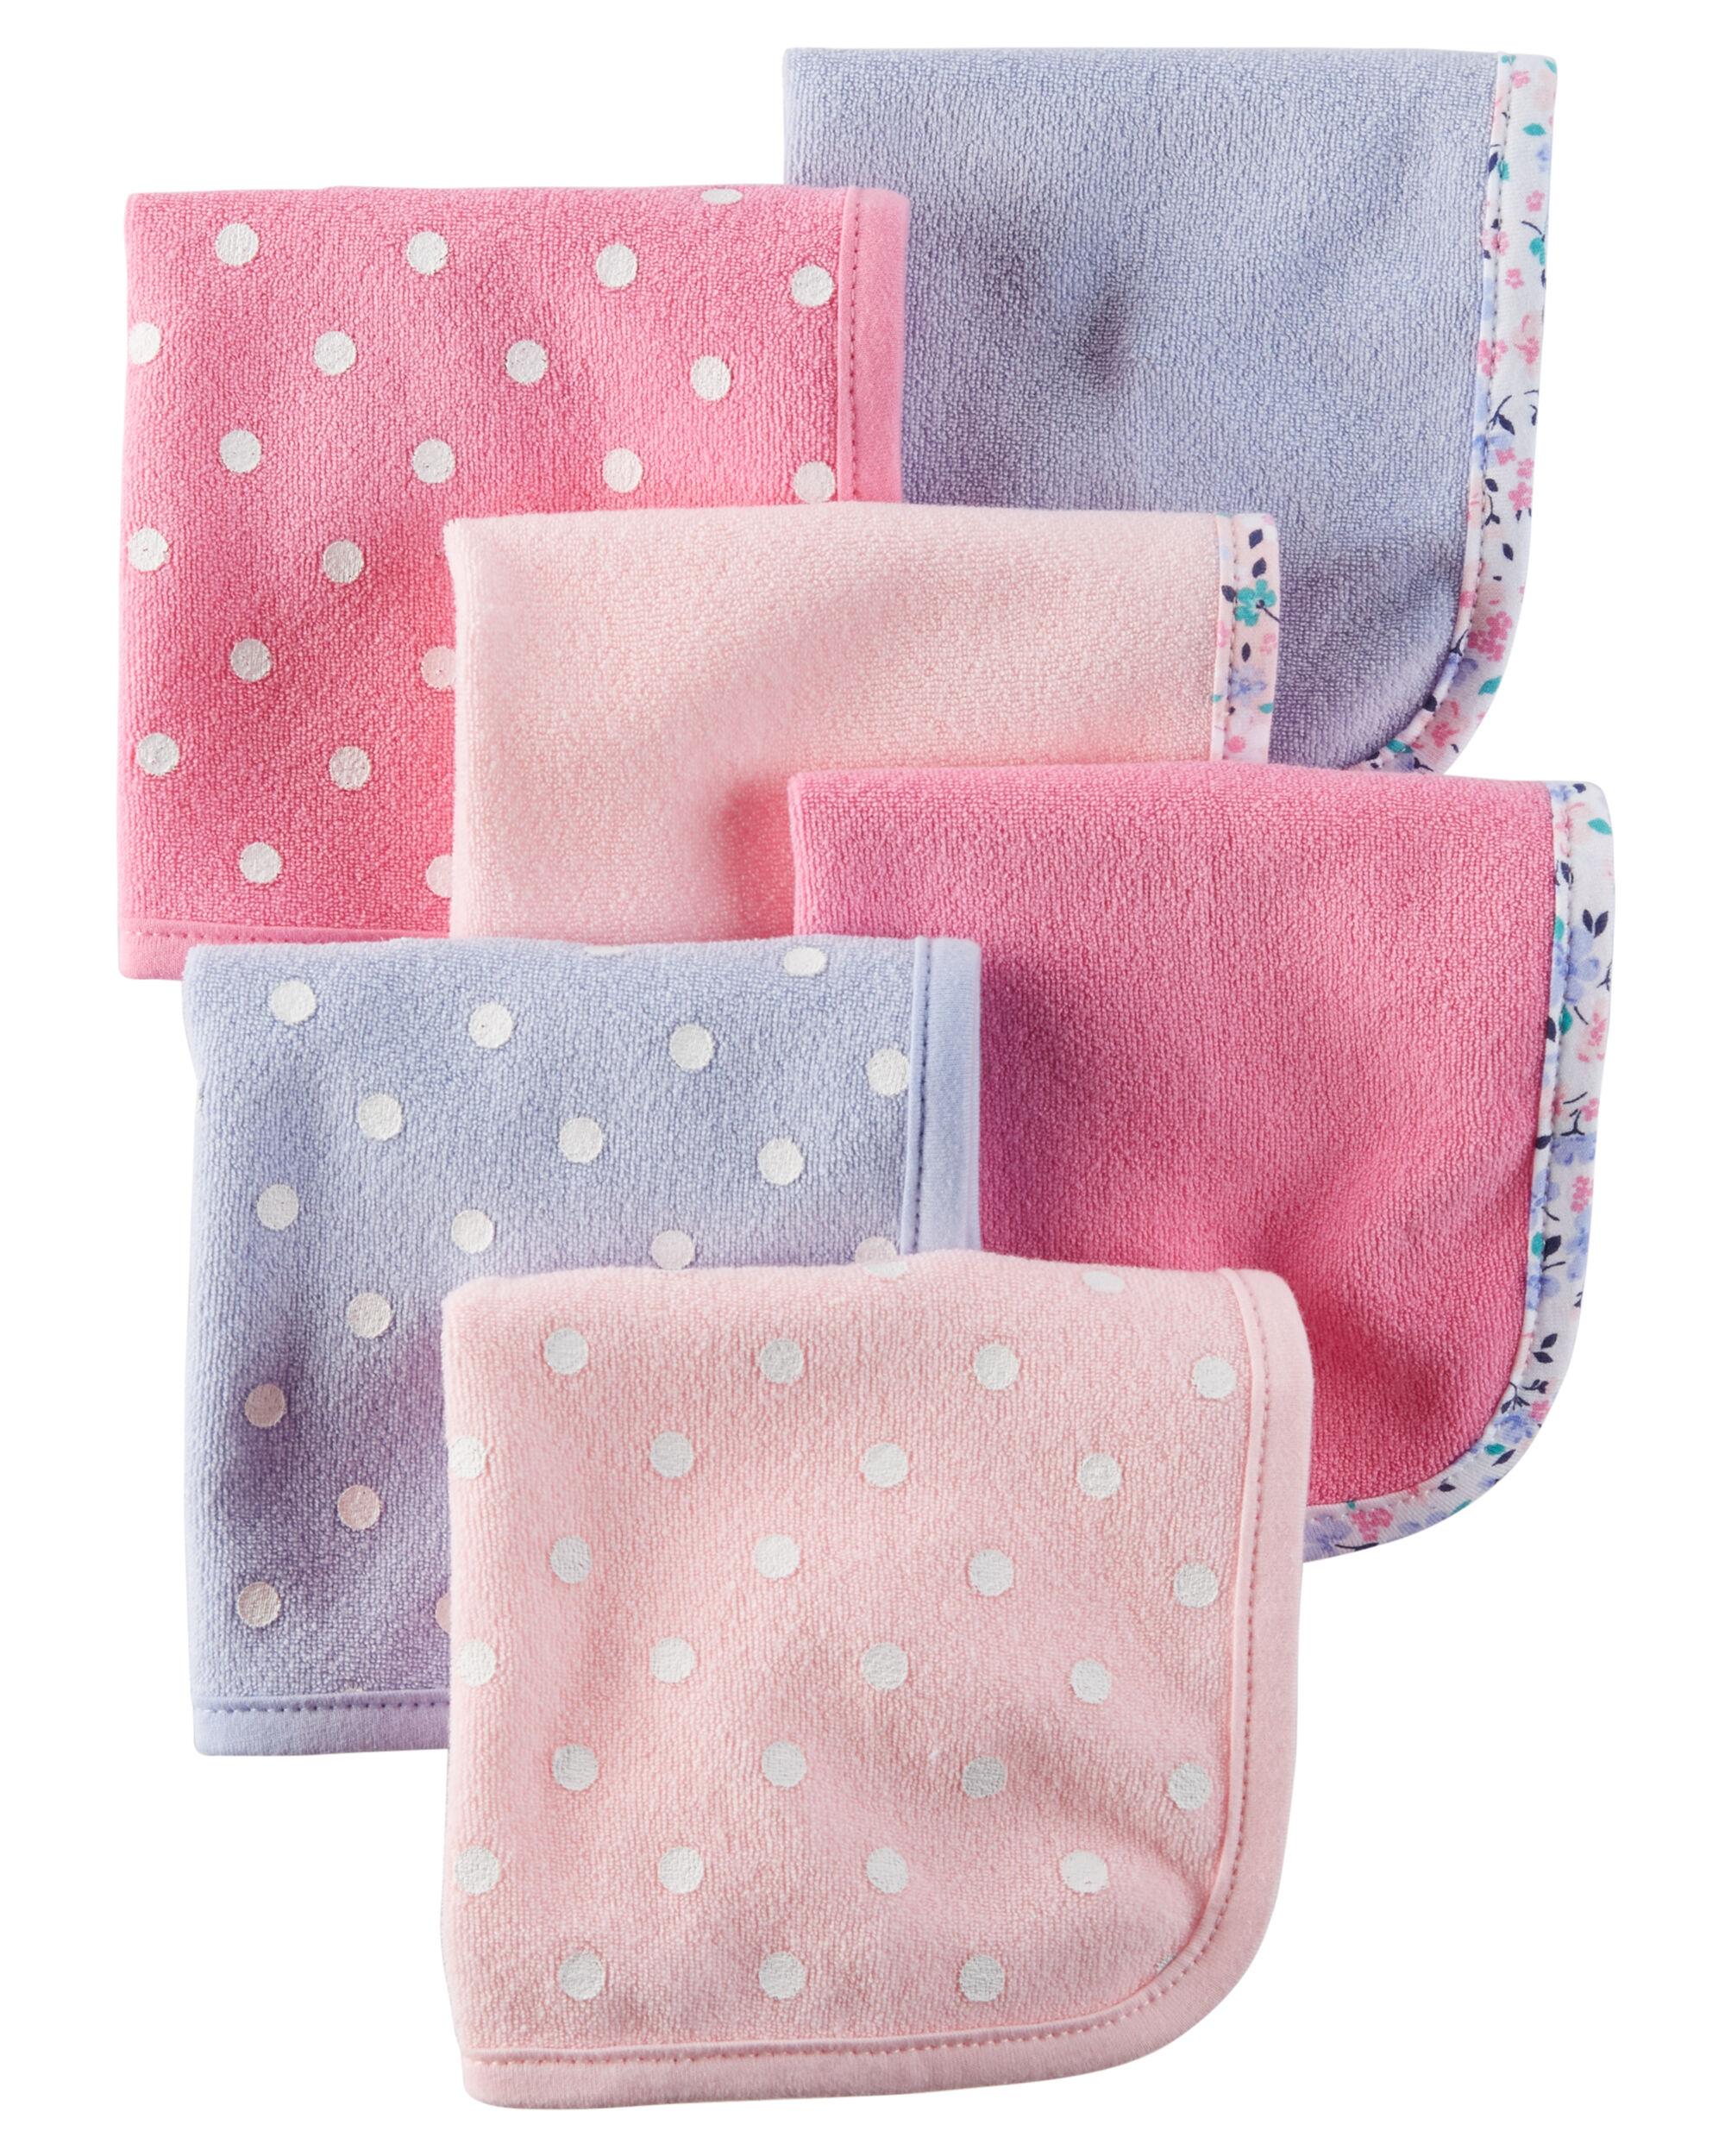 Wash Cloths As Burp Cloths: 6-Pack Terry Washcloths